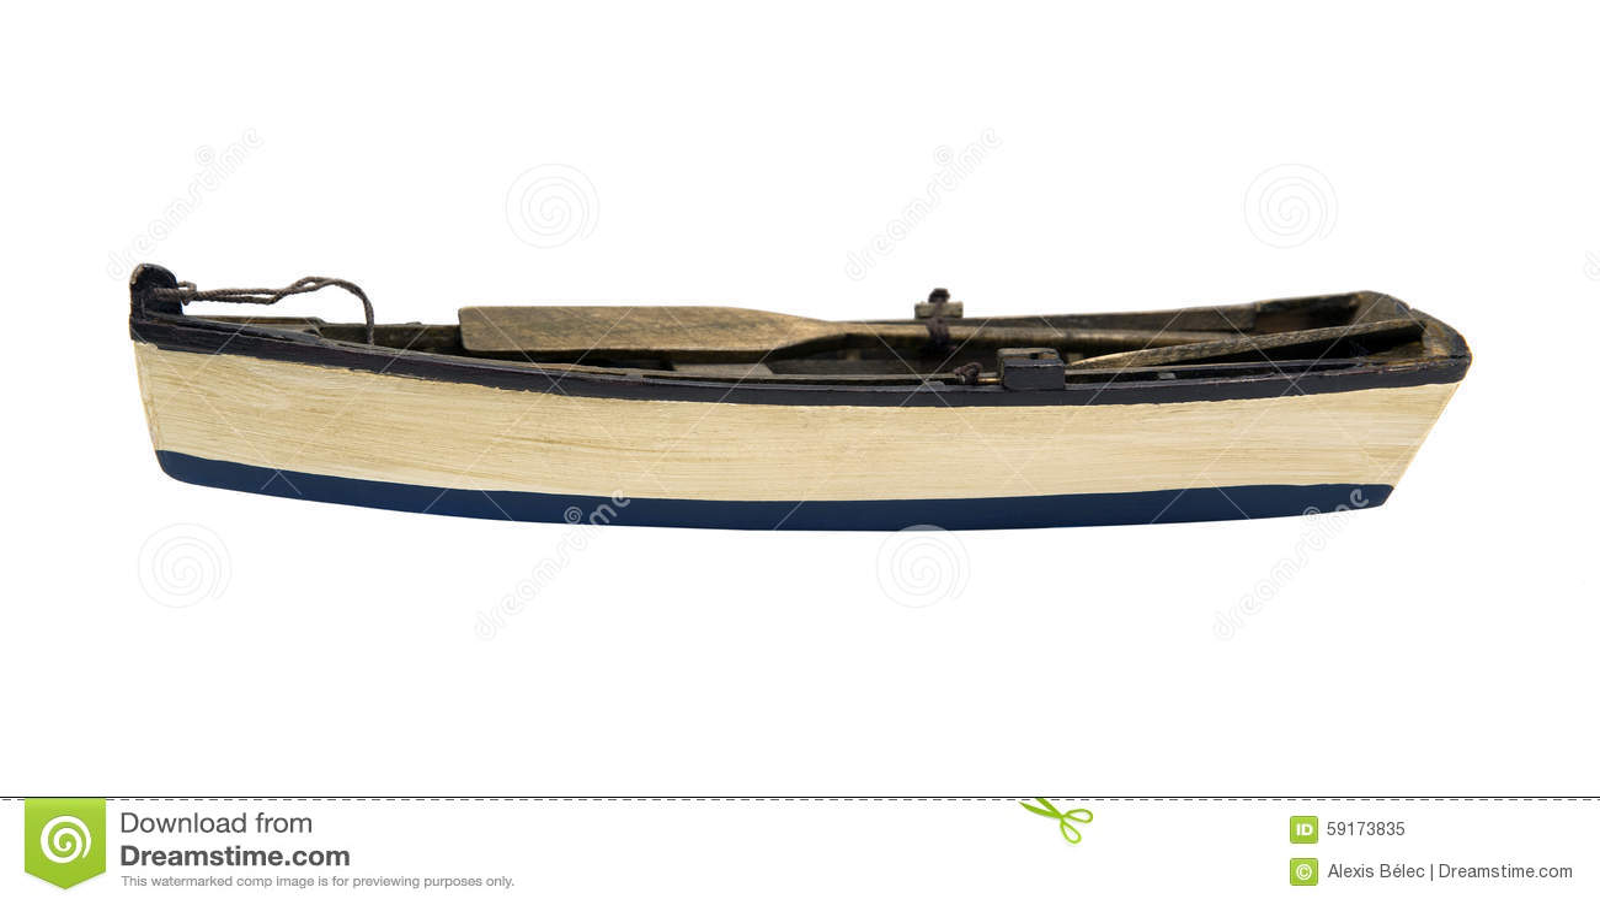 Wooden Paddle Boat Stock Photo - Image: 59173835